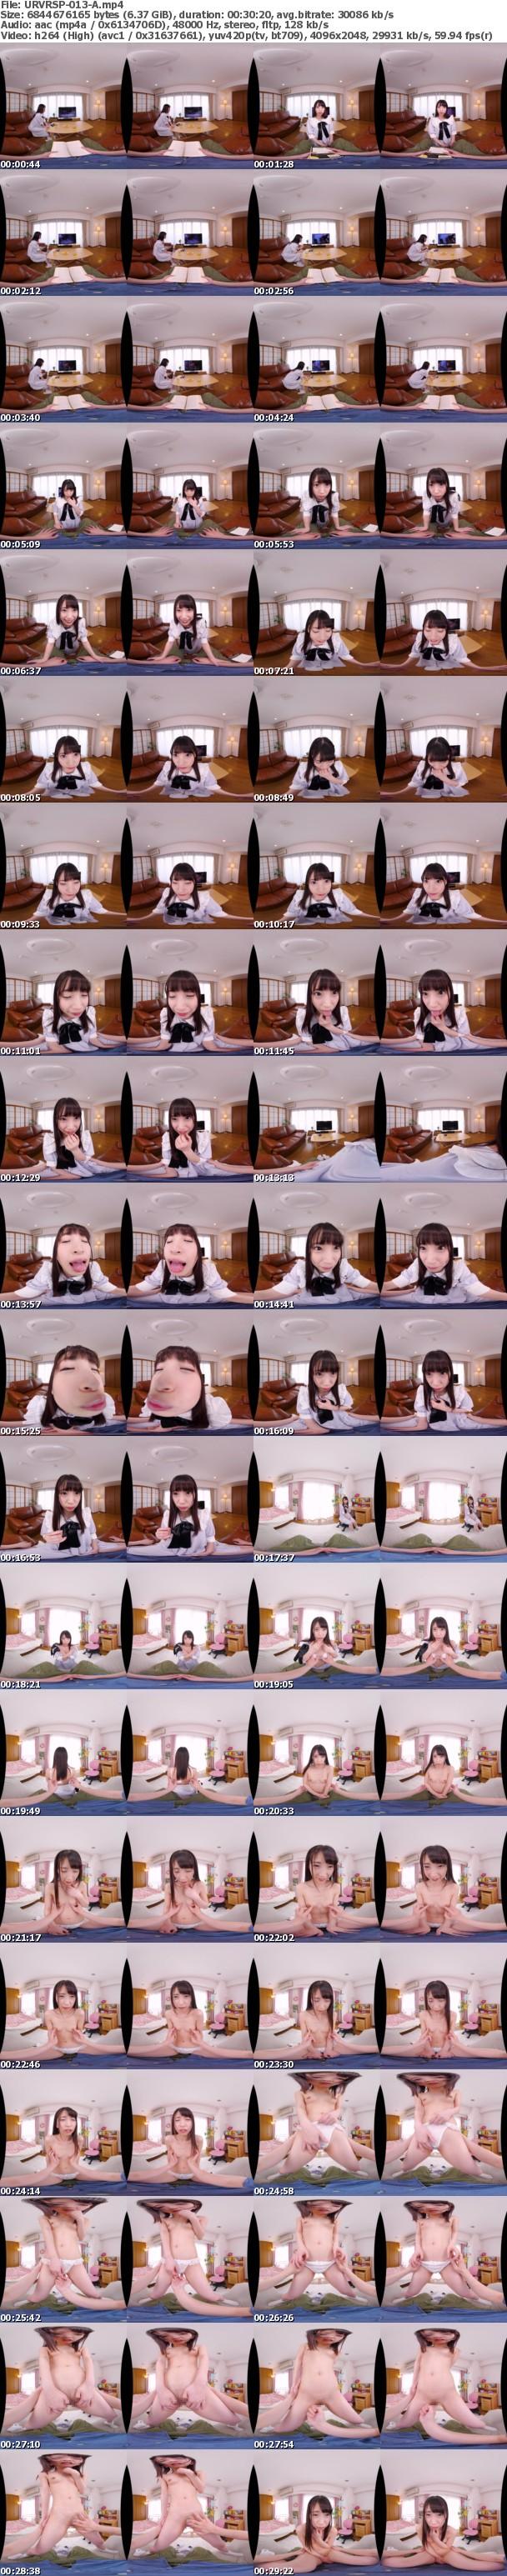 (VR) URVRSP-013 「お兄ちゃん、キスってどんな感じなの?」 ~キスに興味を持ち始めた思春期の妹と親には内緒の兄妹性交~ 冬愛ことね